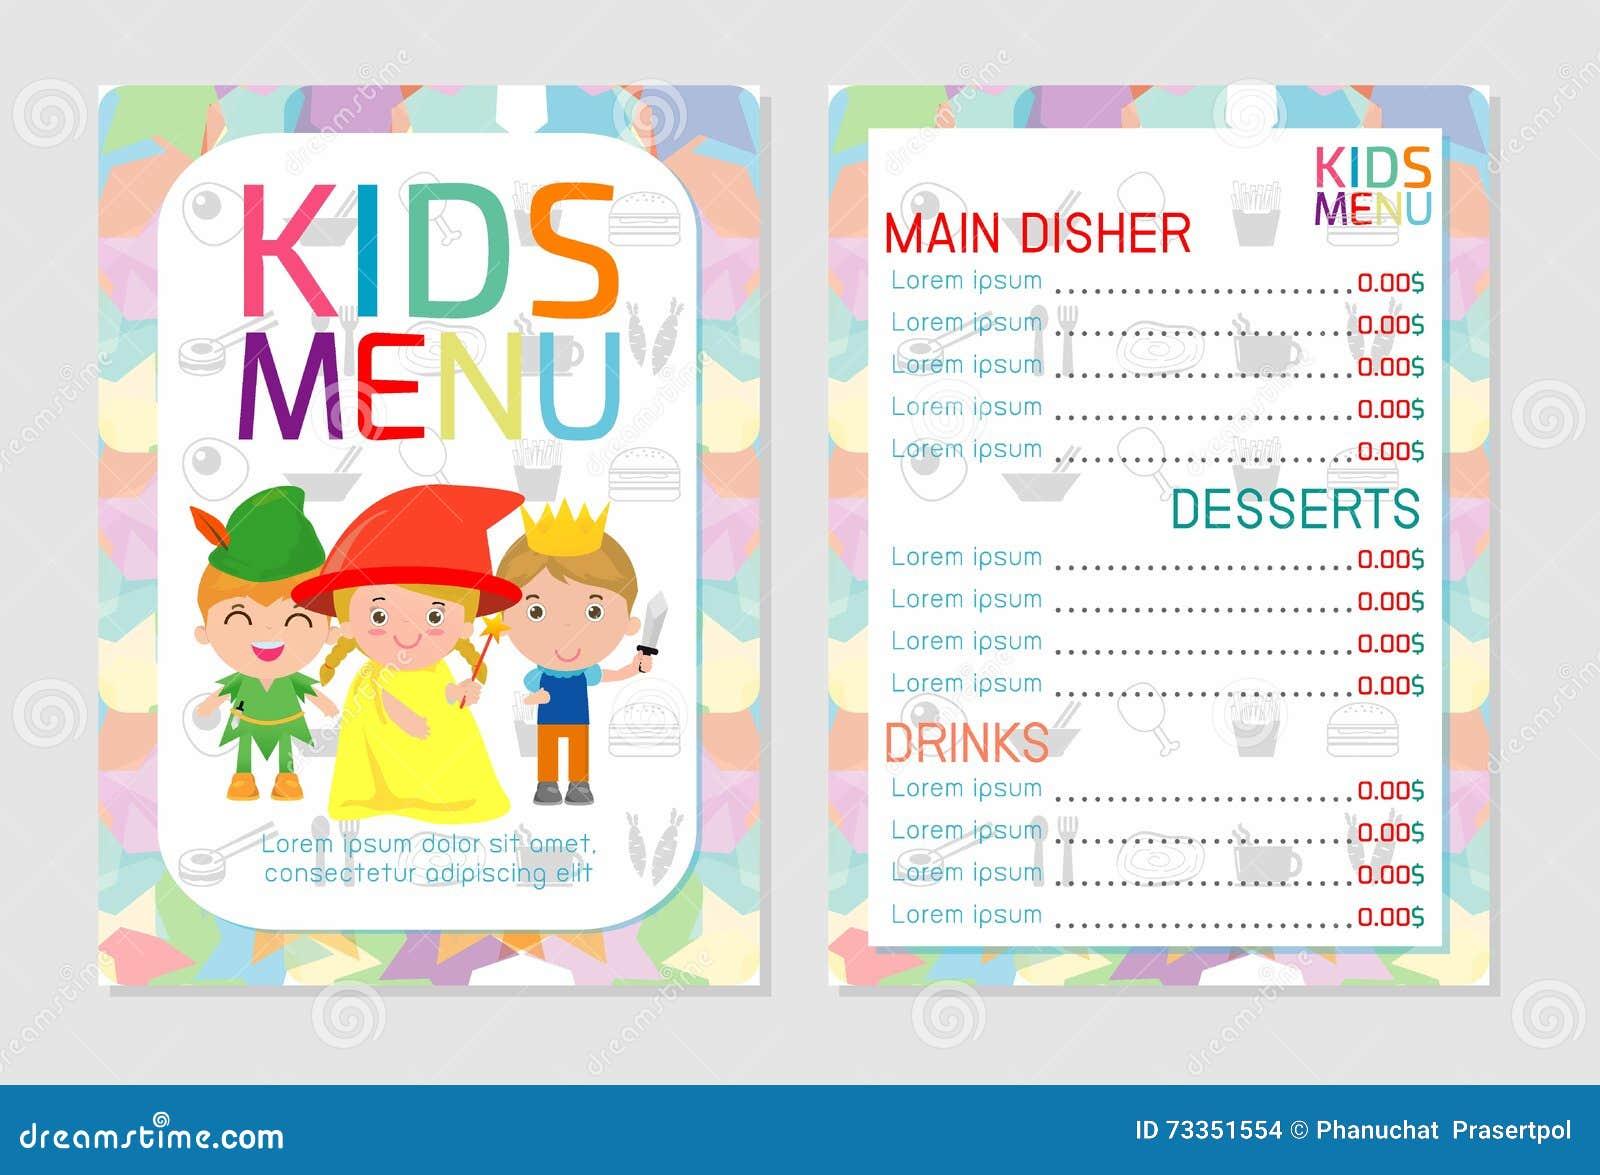 Child Development School Tri Fold Brochure Template Day Care